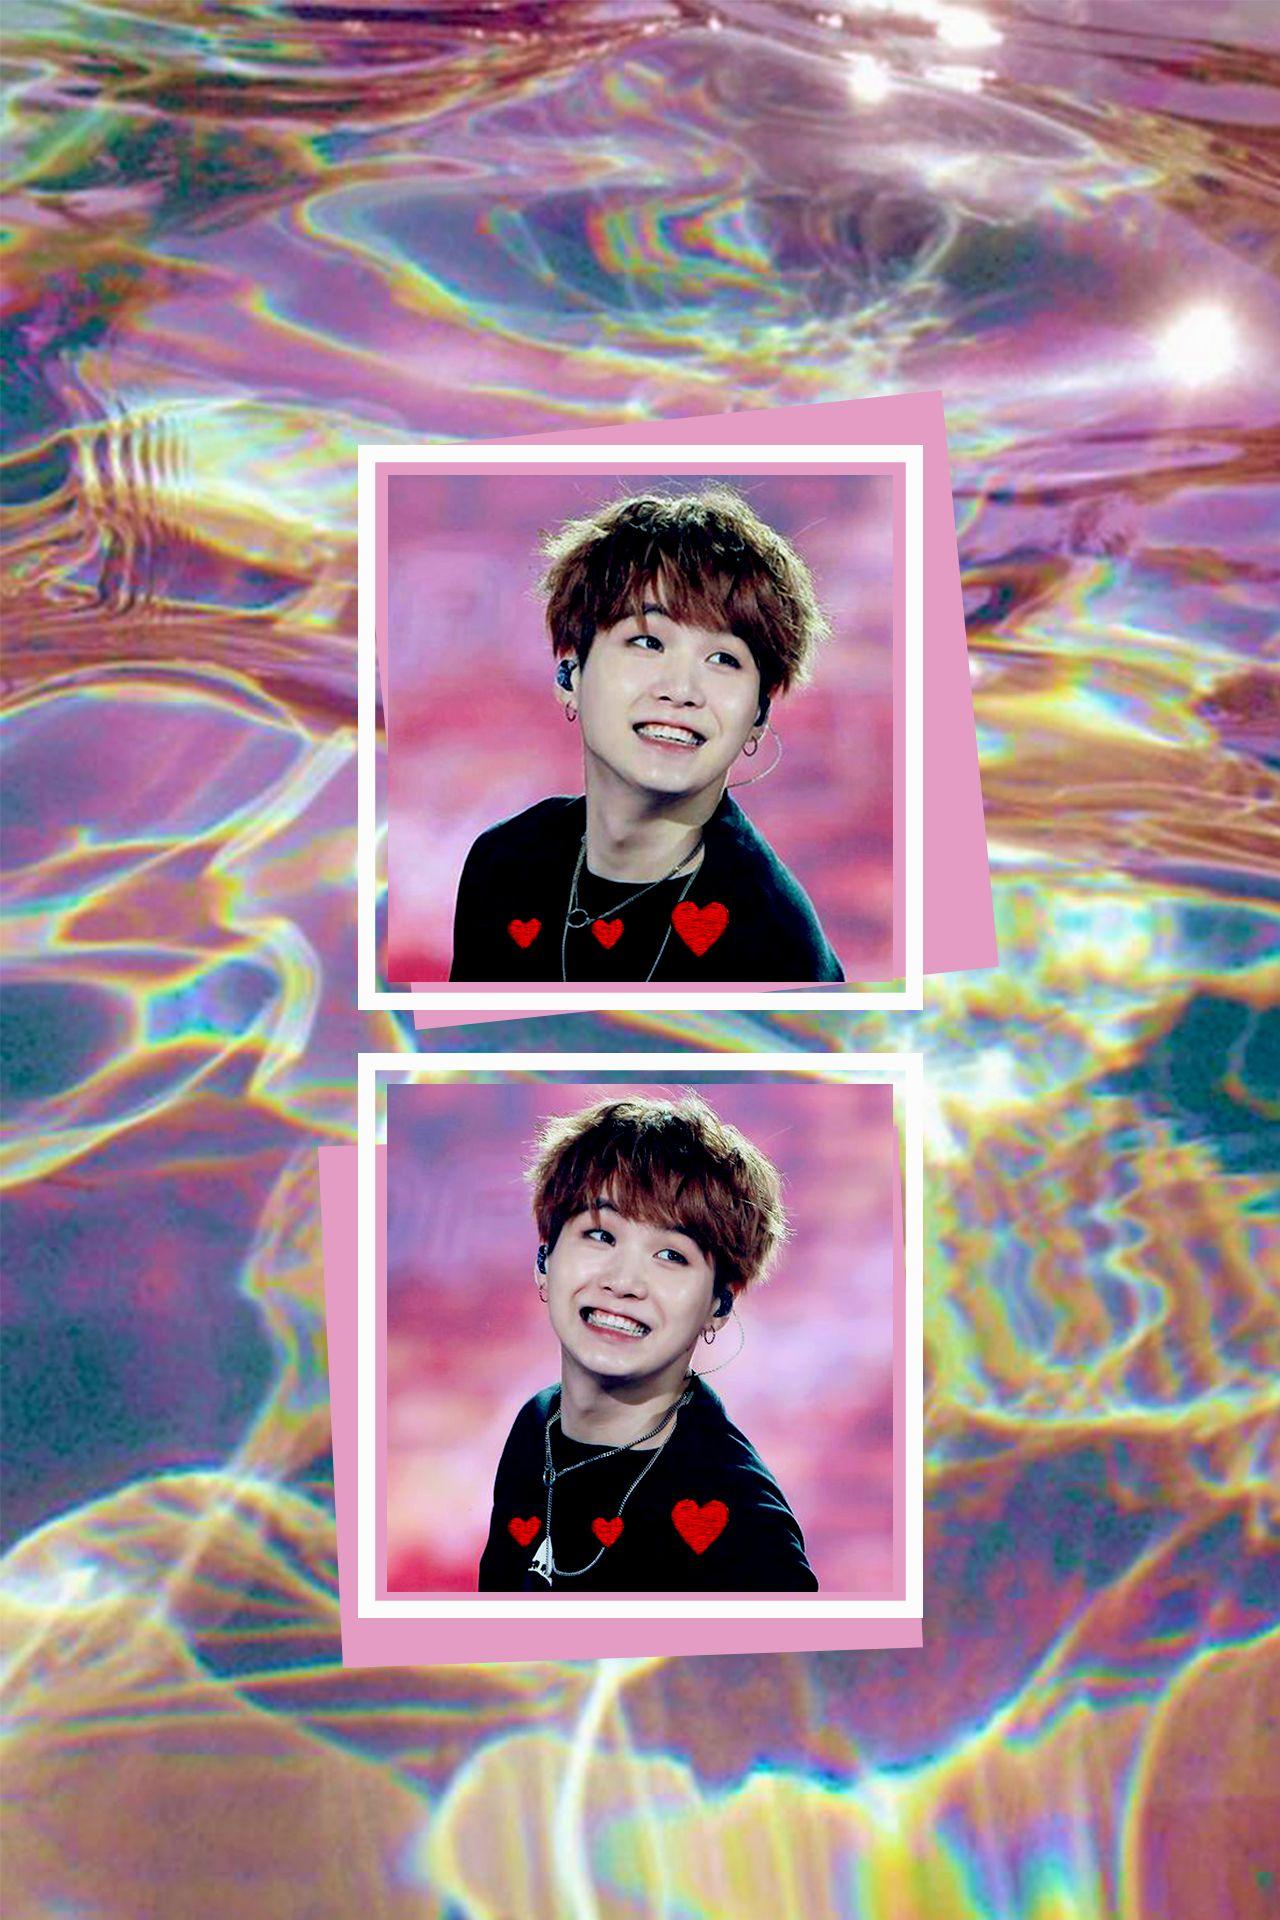 Min Yoongi Aesthetic Wallpaper Bts Suga Wallpaper Pink Agustd Smilin At U Aesthetic Wallpapers Instagram Aesthetic Pastel Aesthetic